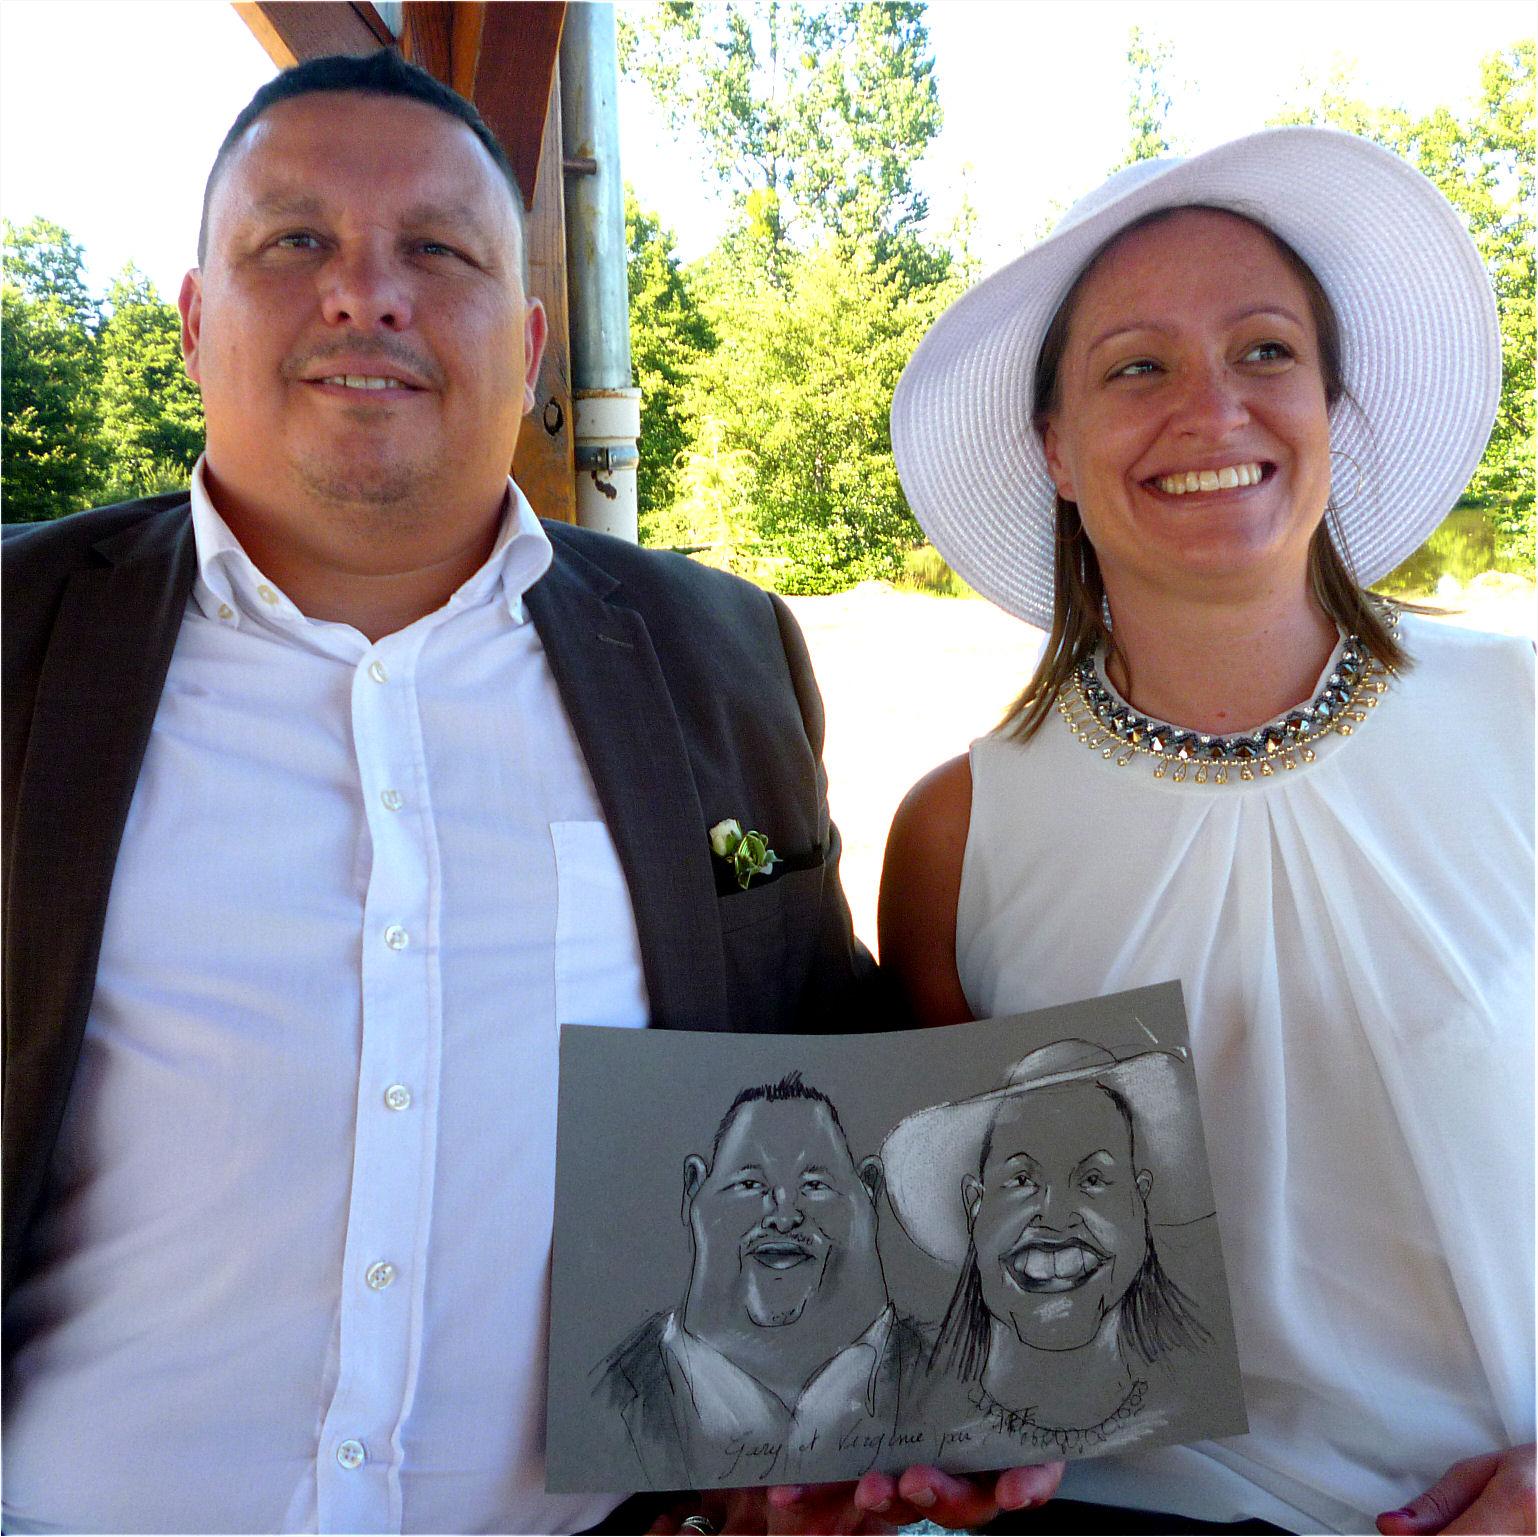 Gary et Virginie caricature de JEF